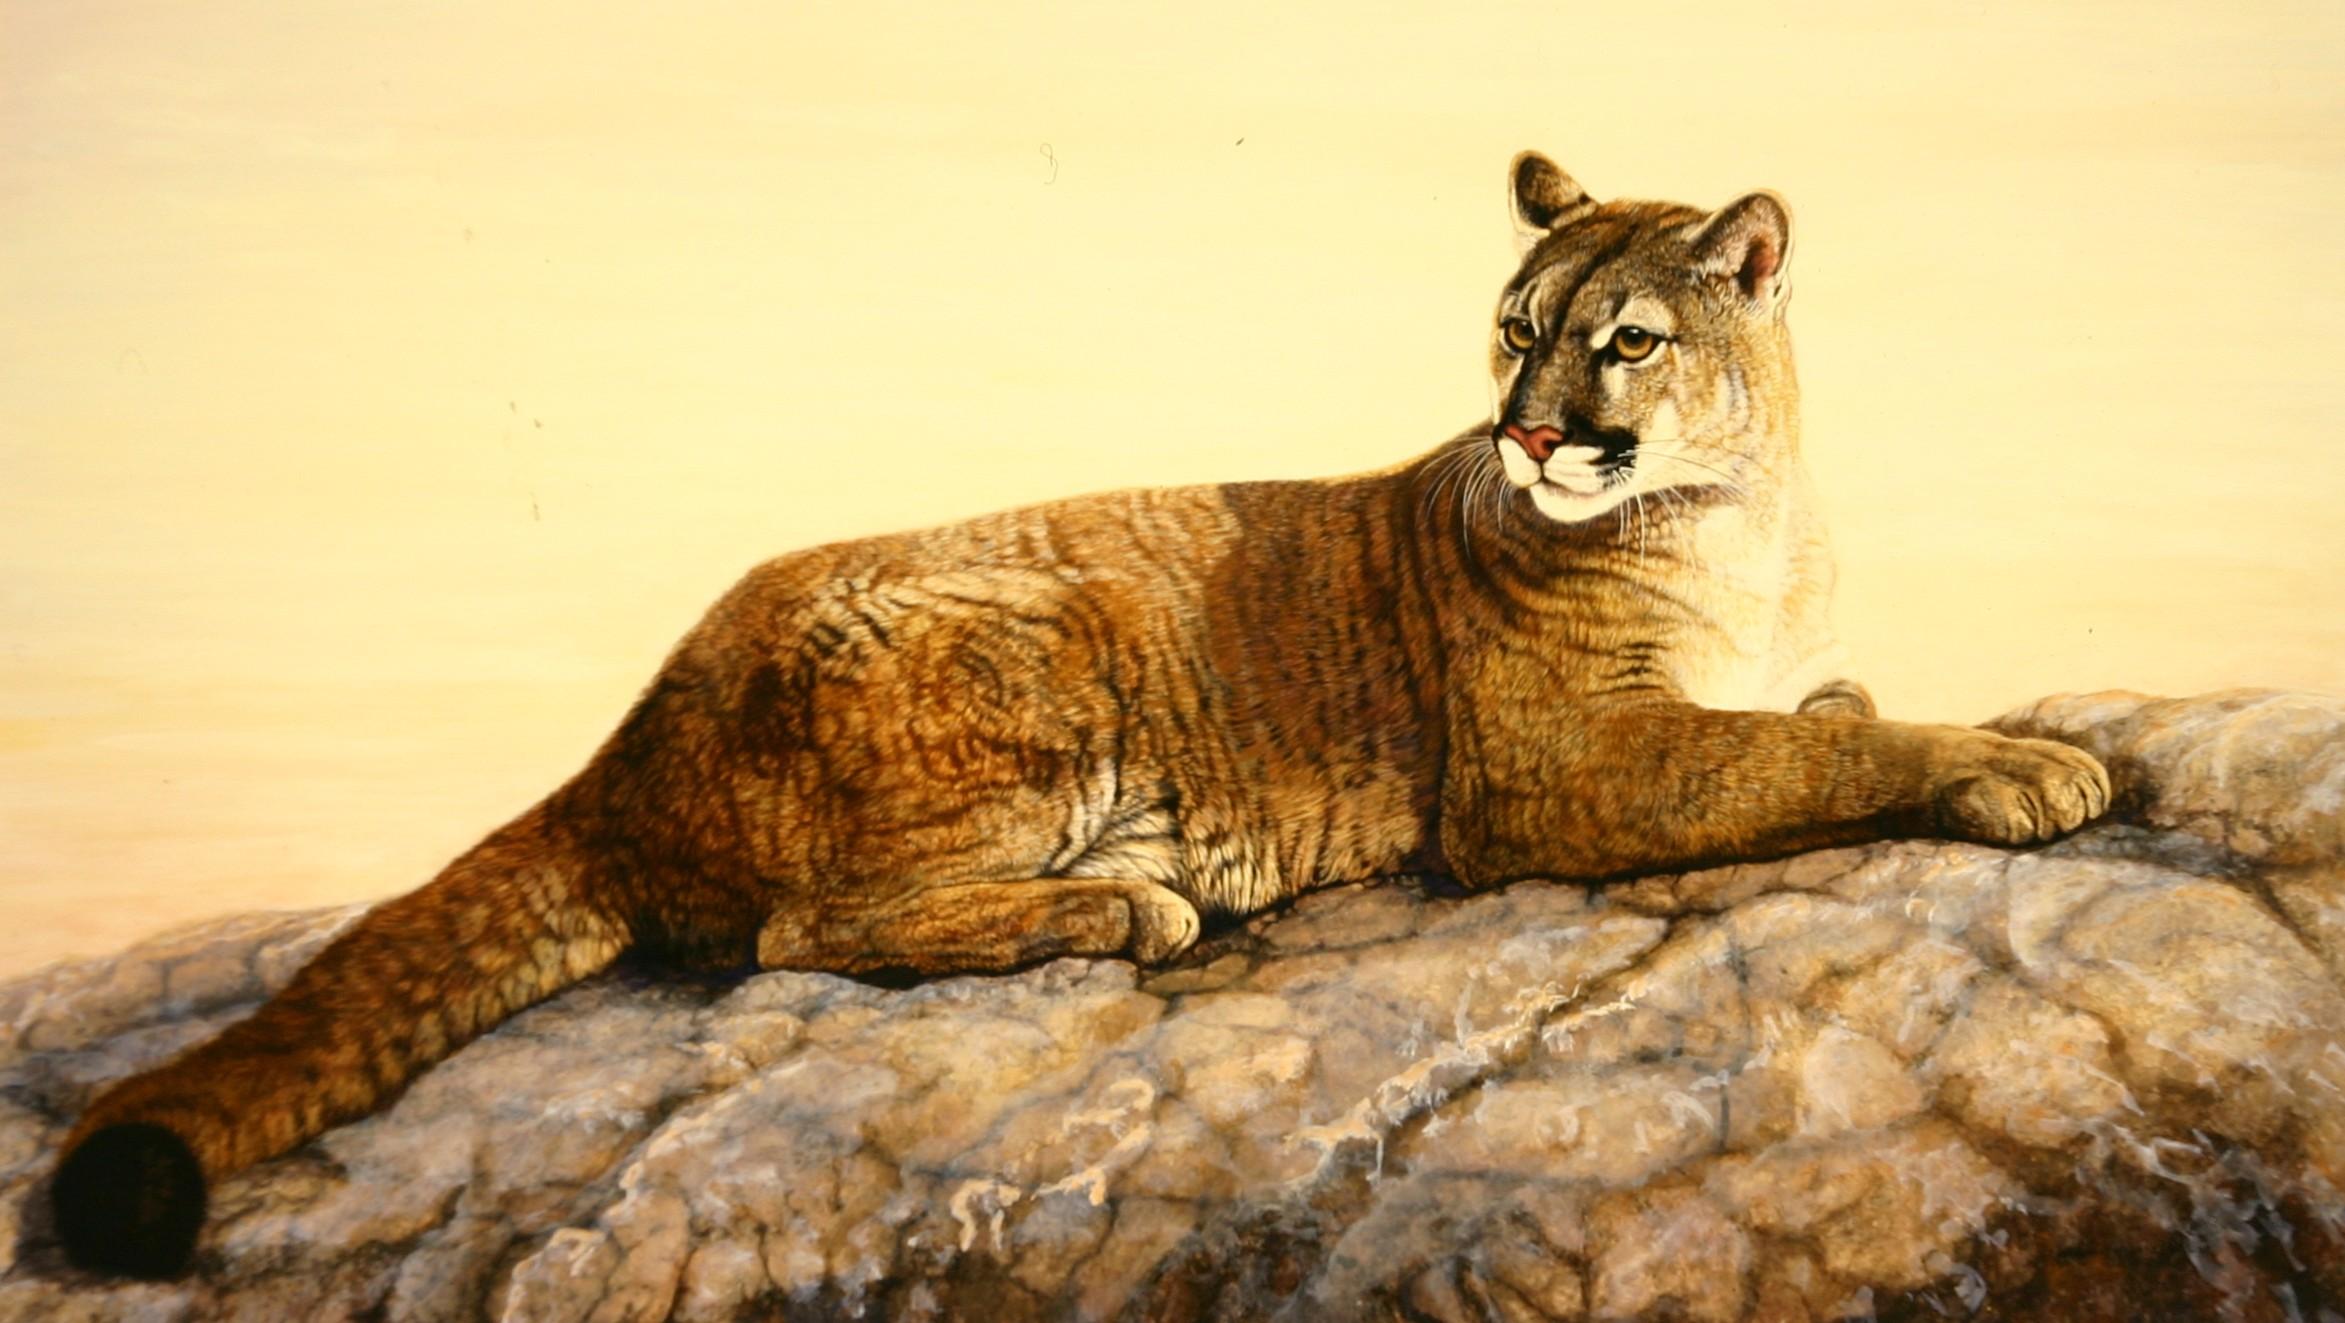 Cougar rock.jpg